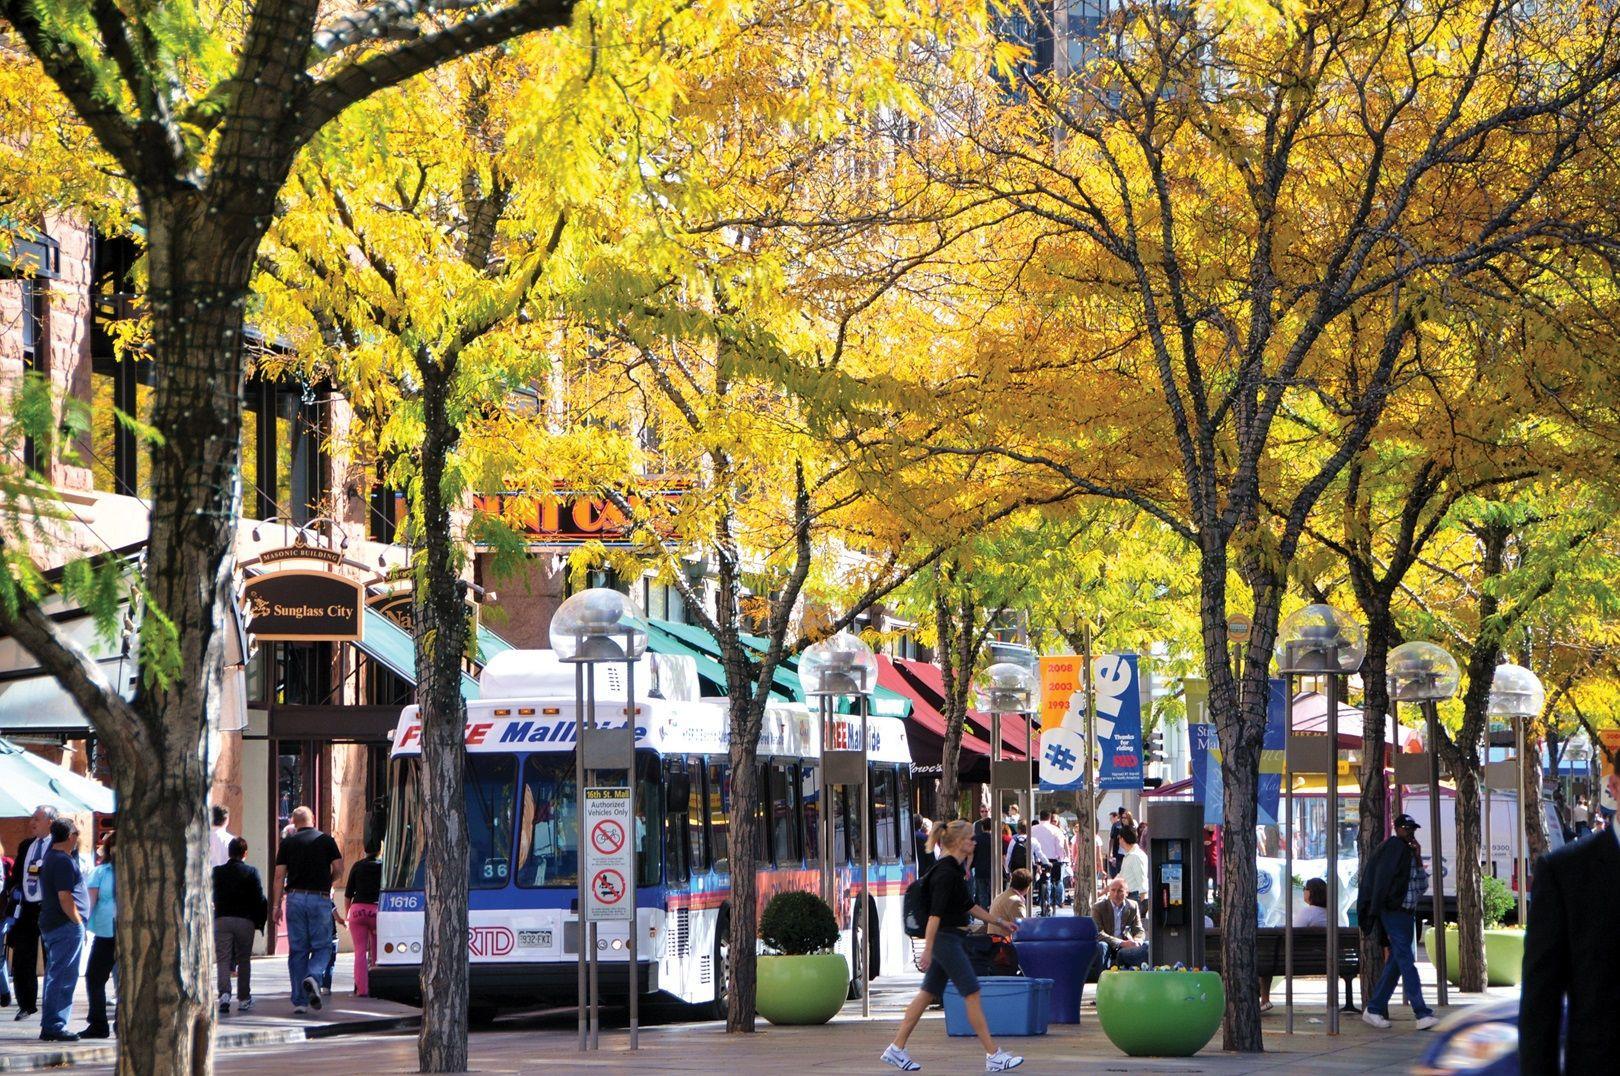 Downtown Denver Restaurants 16th St Mall